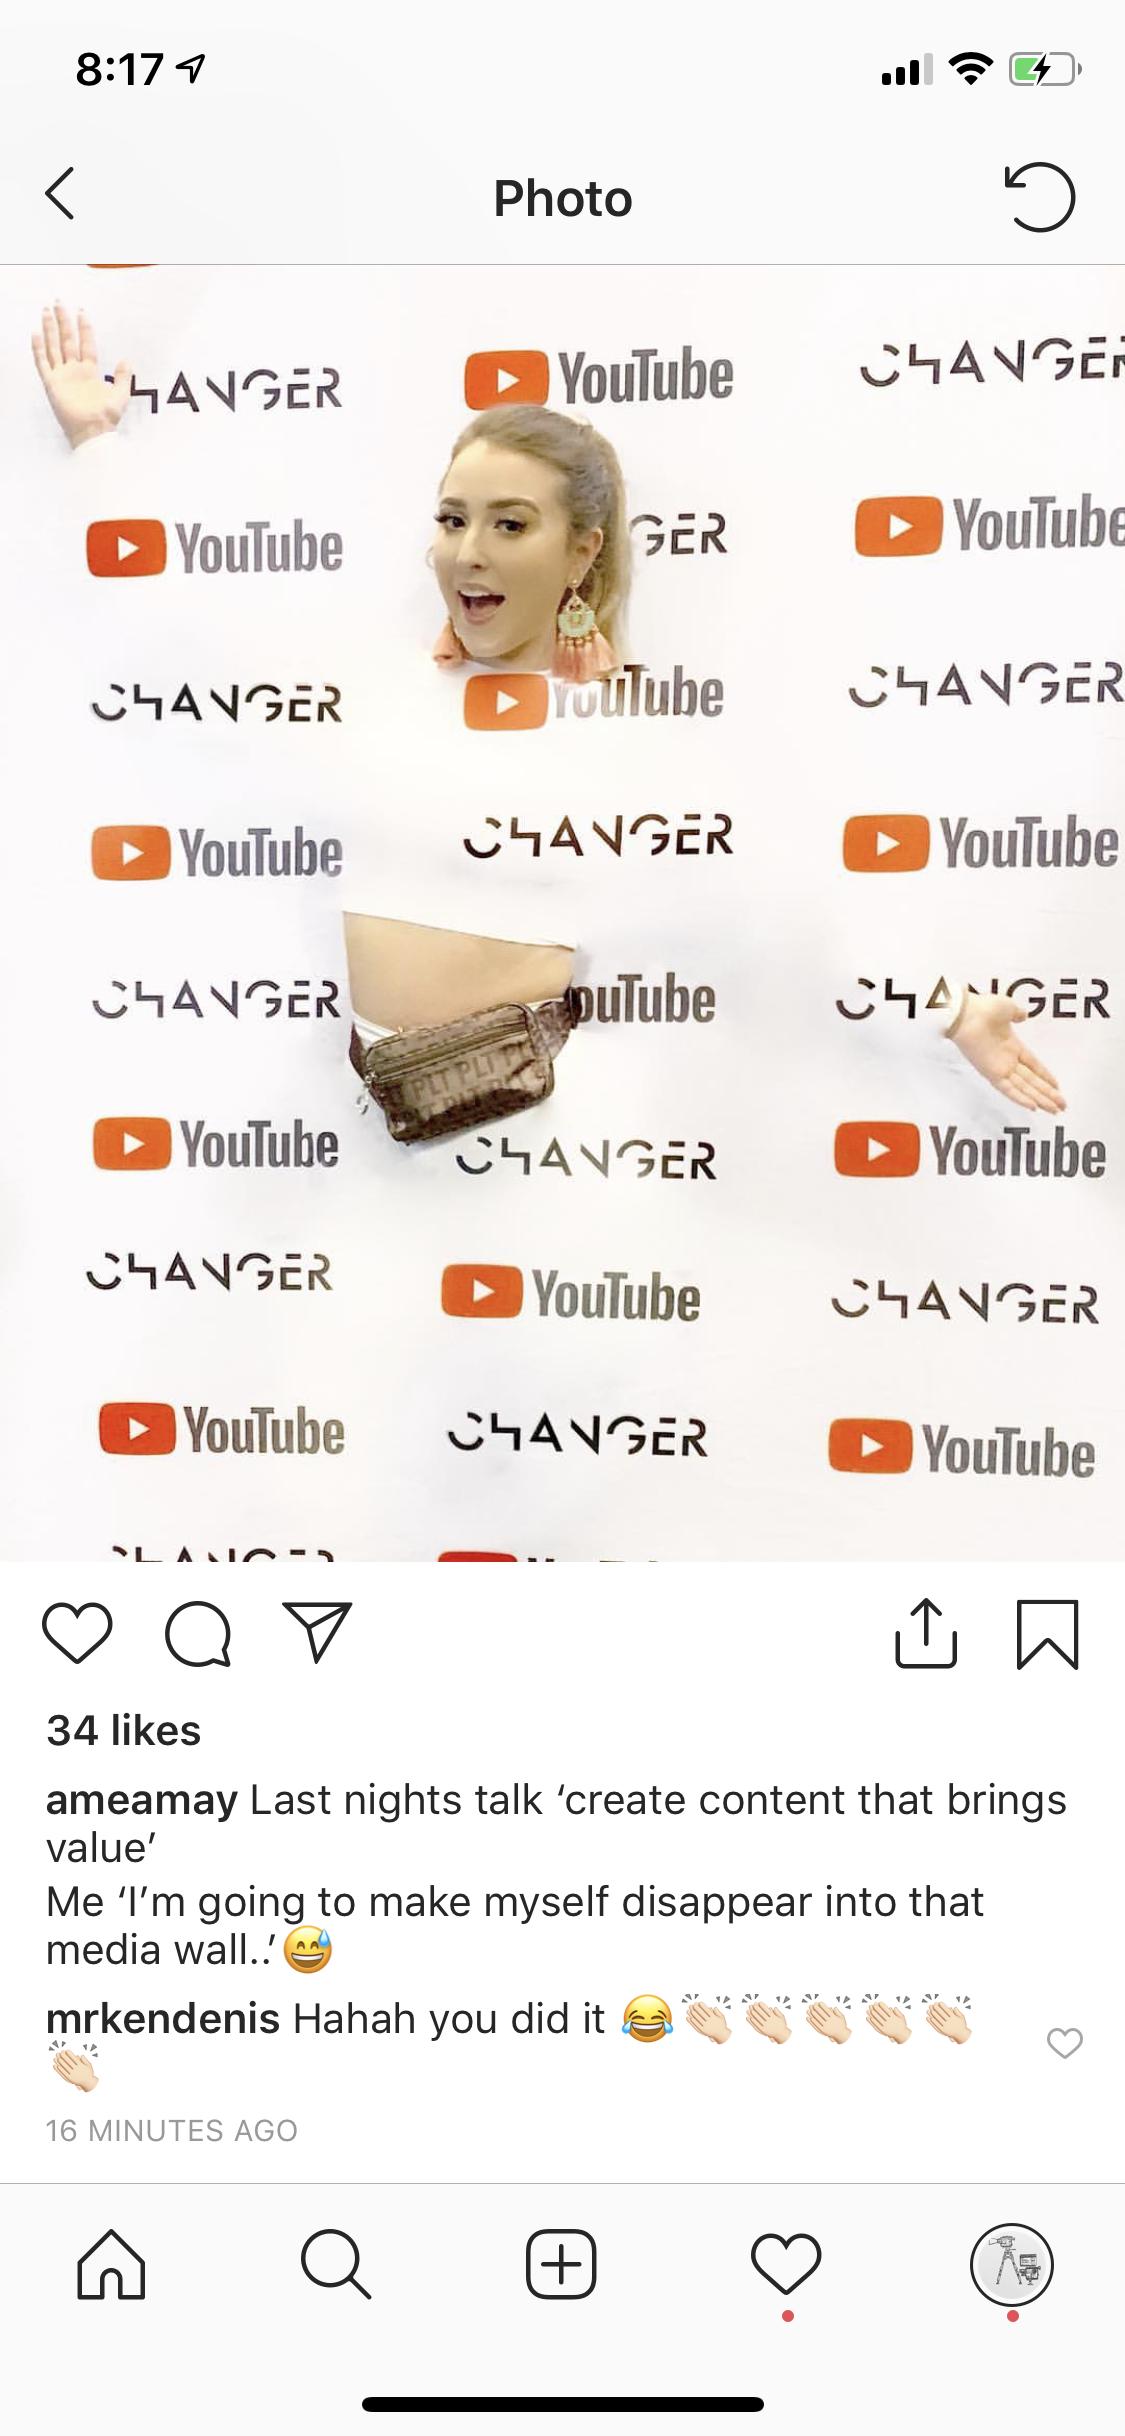 Changer Image